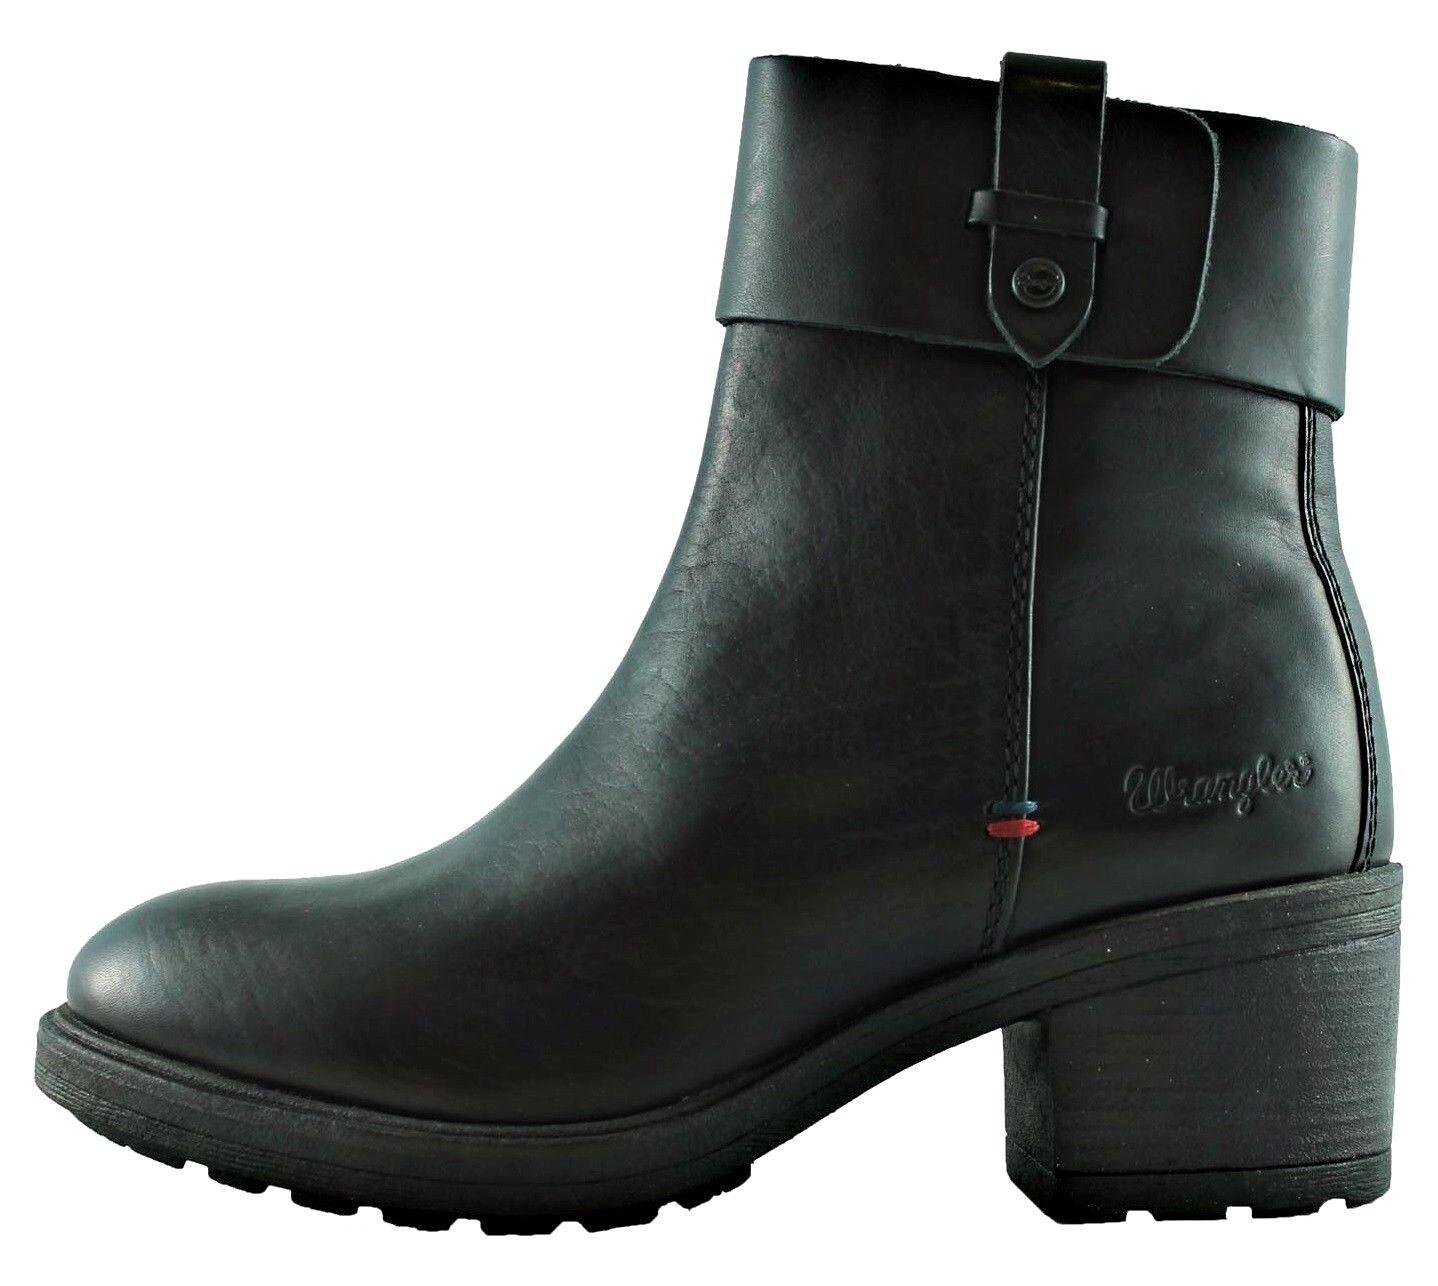 WRANGLER VAIL BOTÍN WL172531 shoes botas botas botas botas de women piel ante 97674f